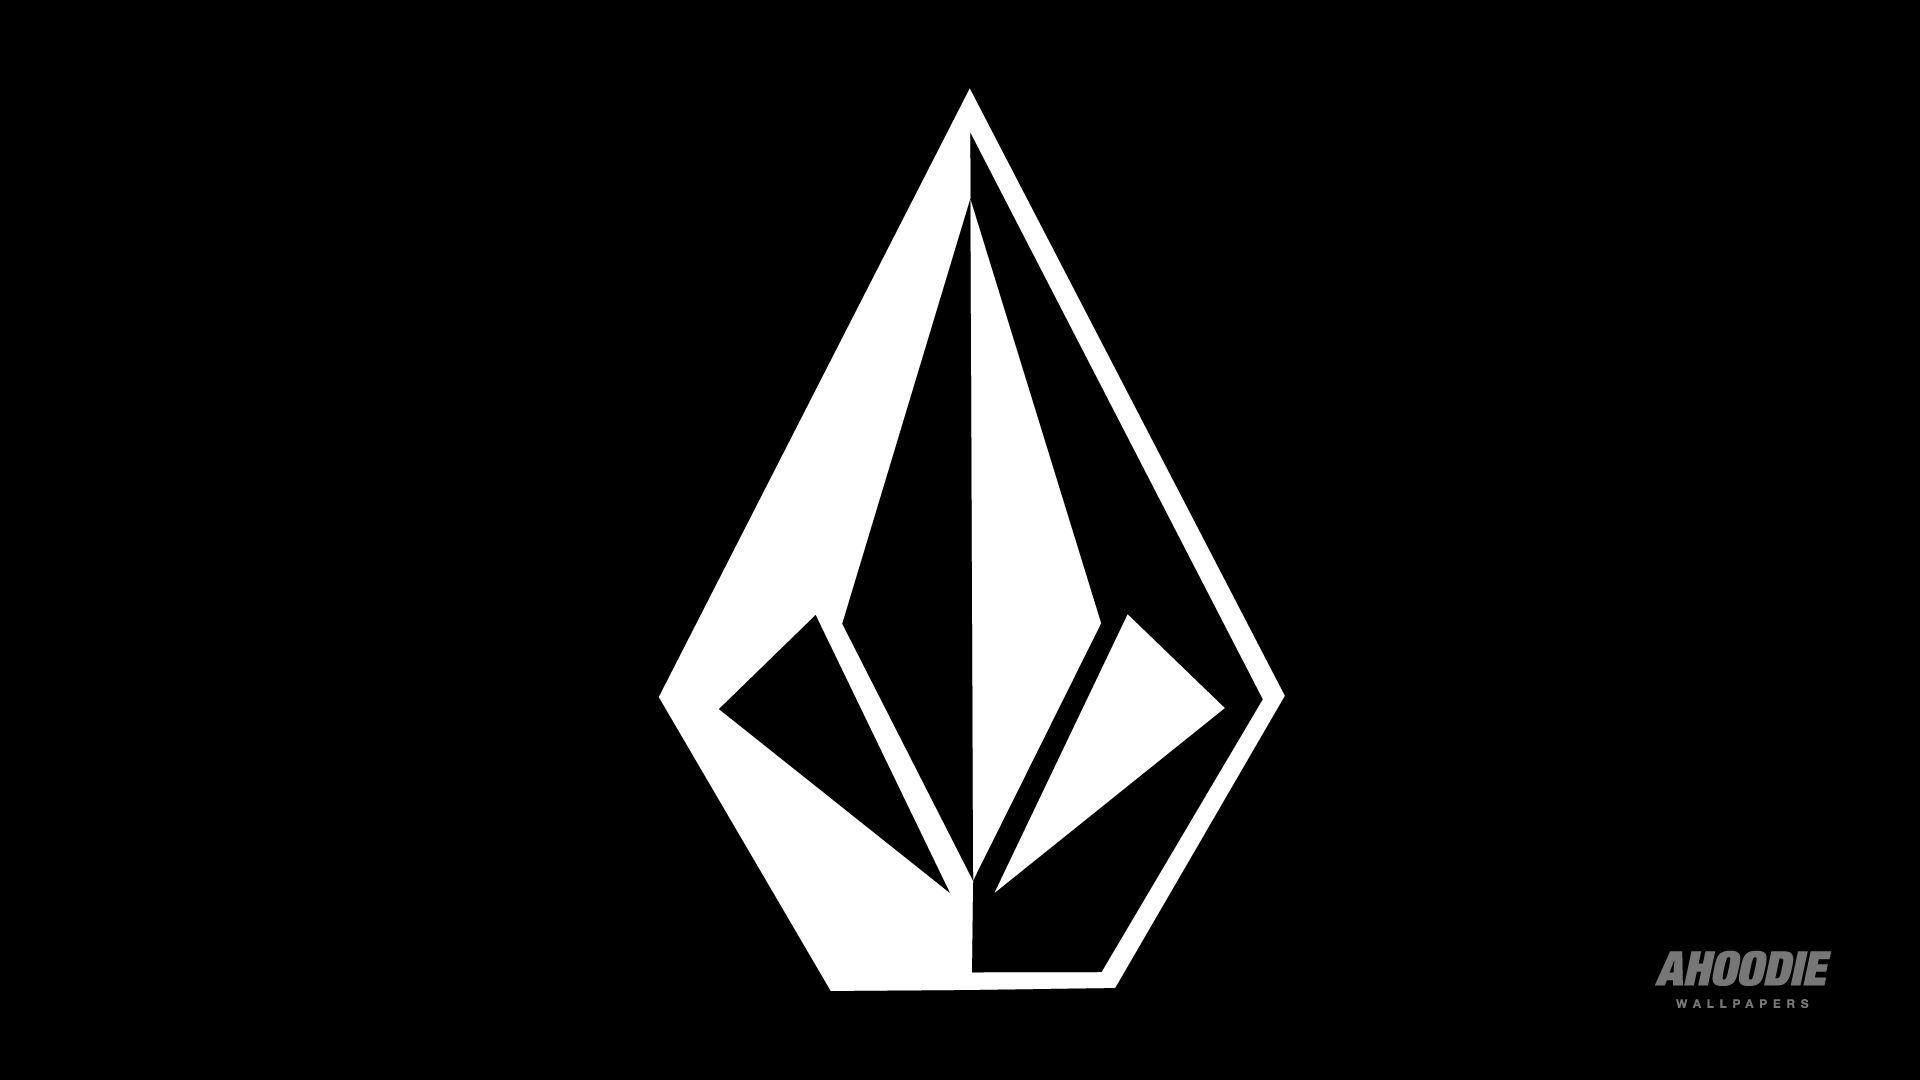 [76+] Volcom Logo Wallpaper on WallpaperSafari